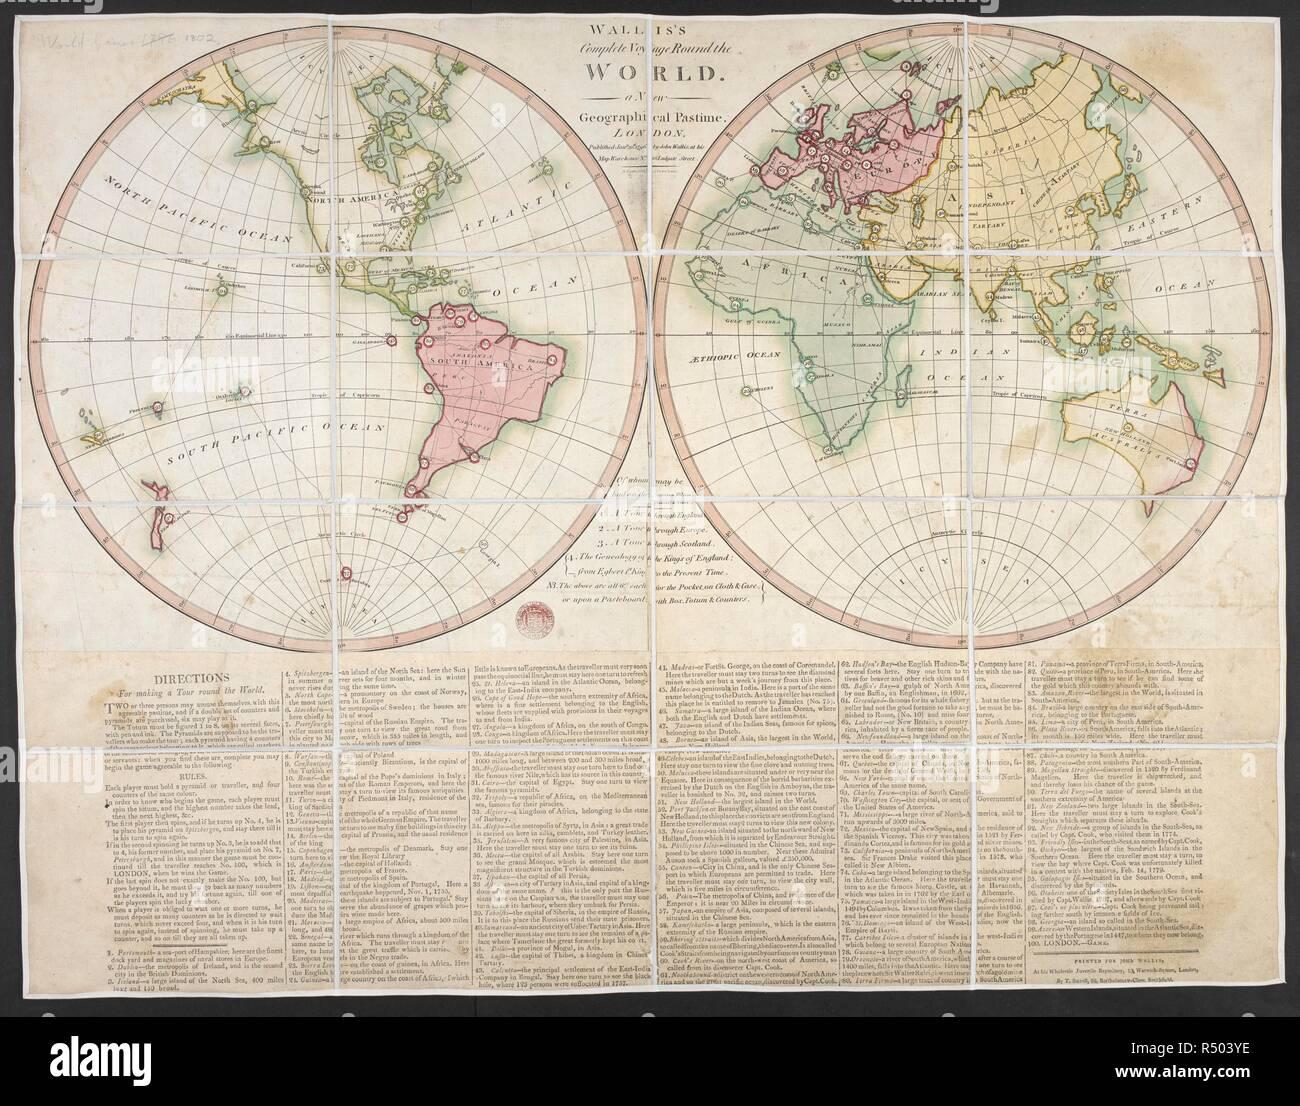 World Maps Equator Stock Photos & World Maps Equator Stock Images ...